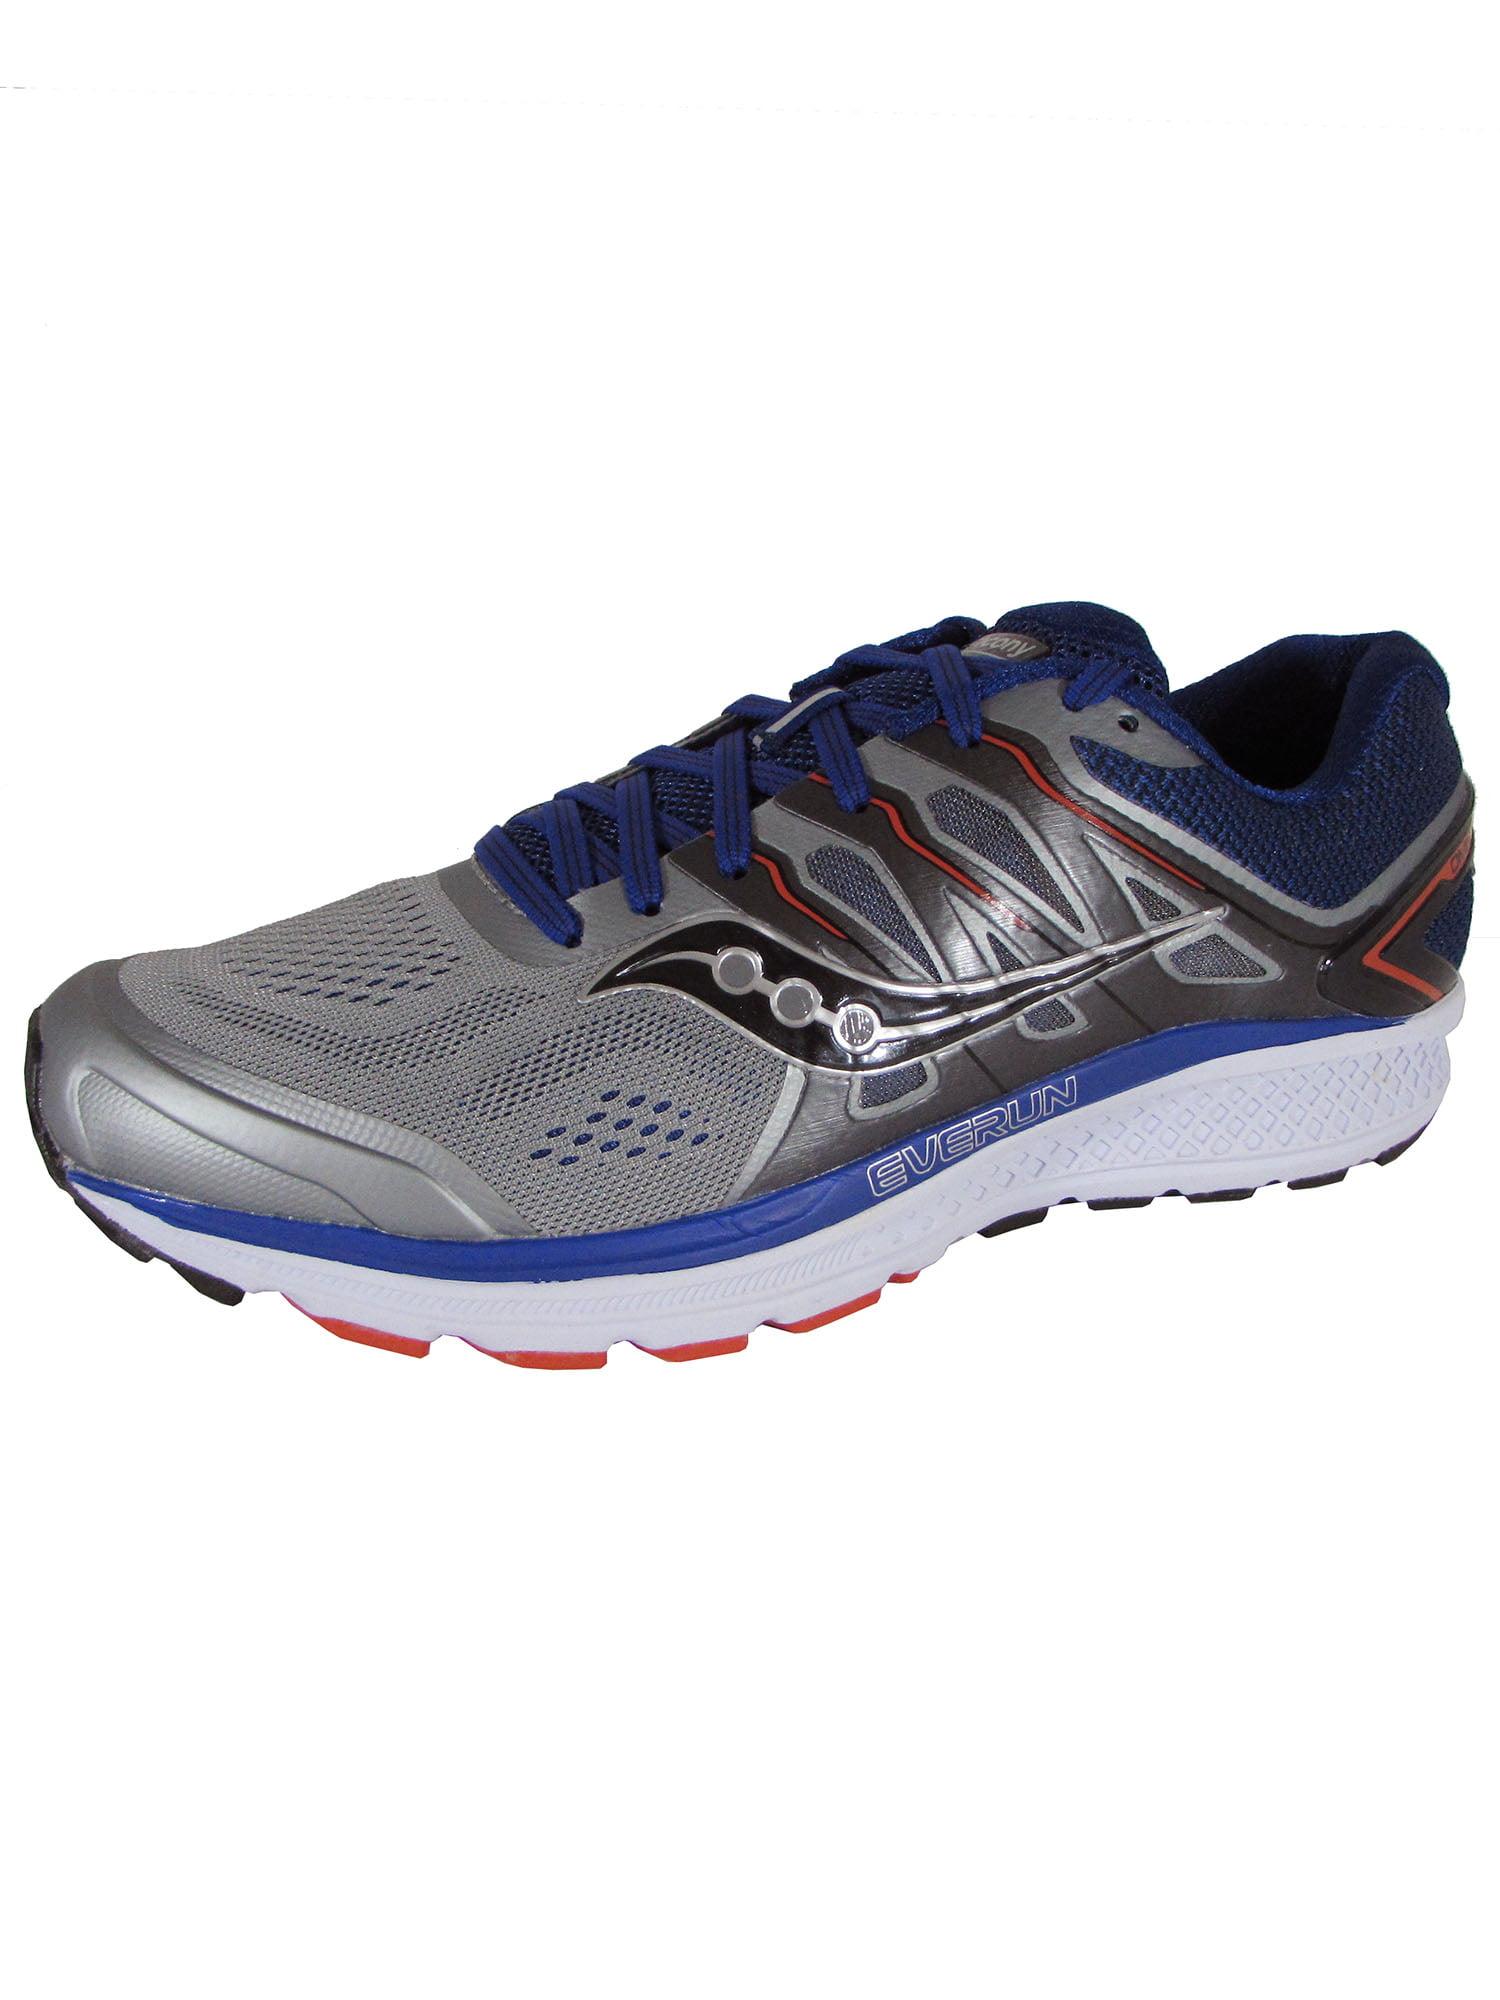 Saucony Mens Omni 16 Running Sneaker Shoes